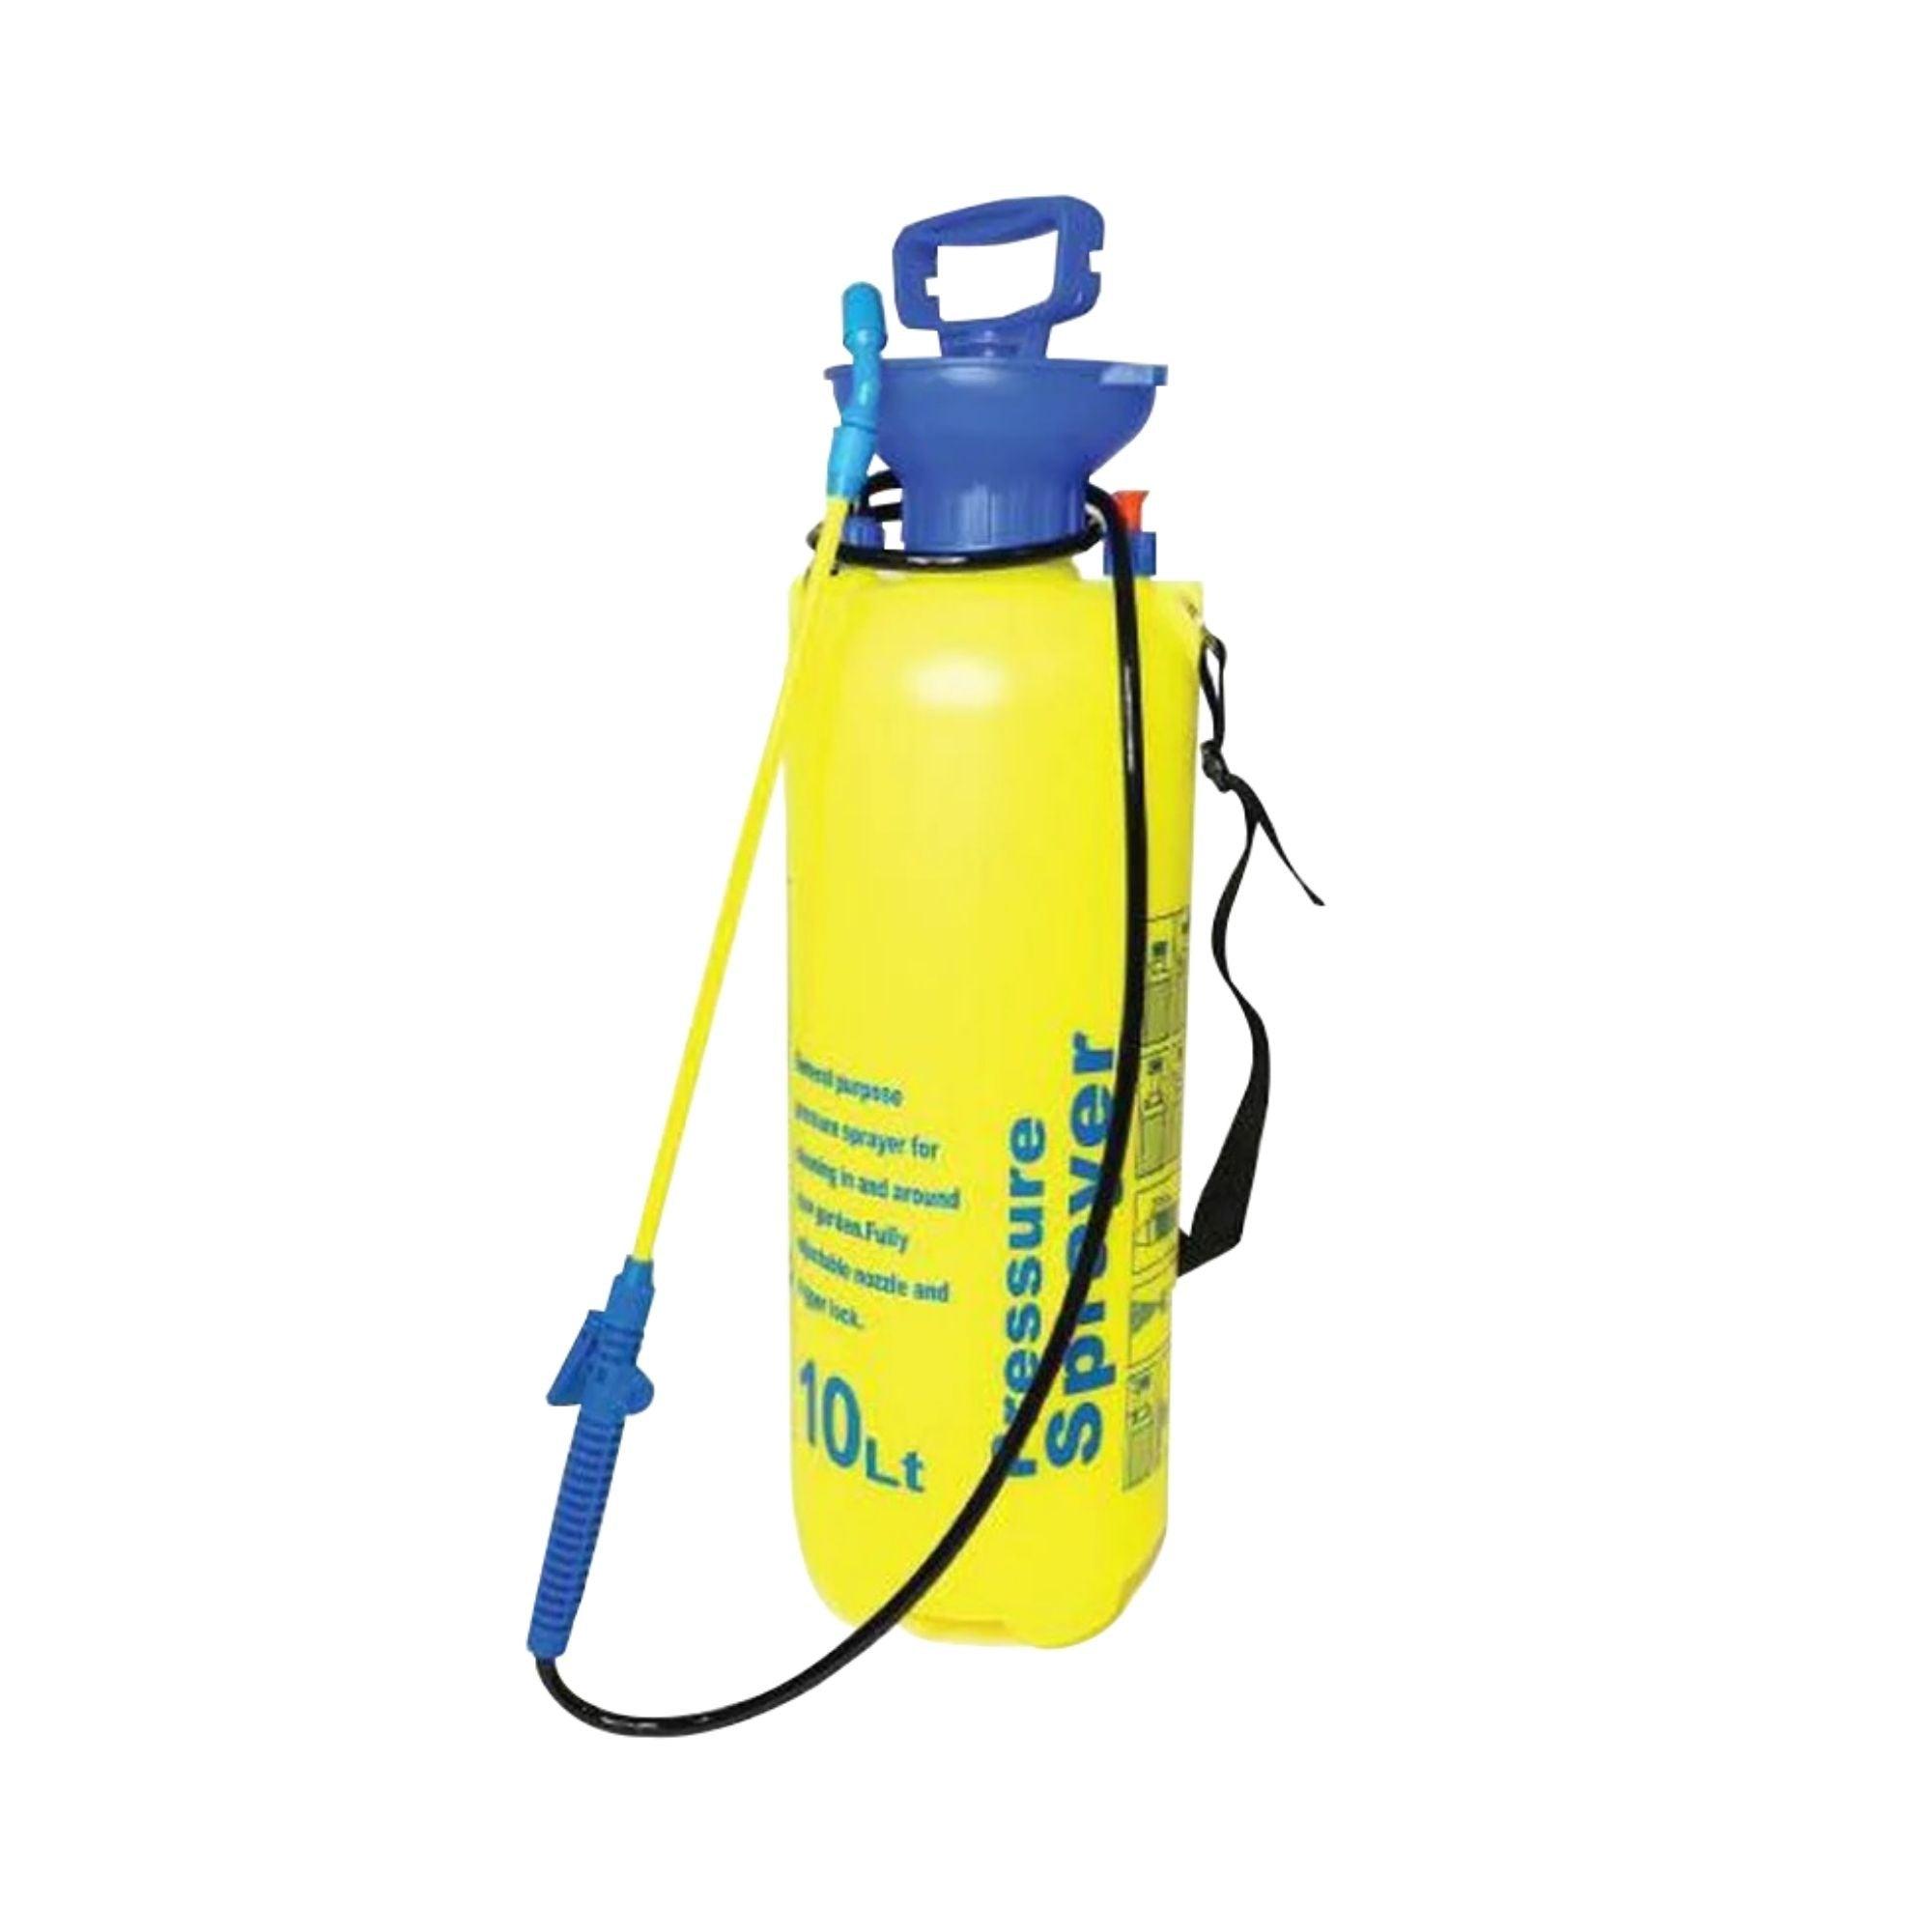 10L Pressure Sprayer Knapsack Portable Garden Yard Weed Pump Pesticide Chemical